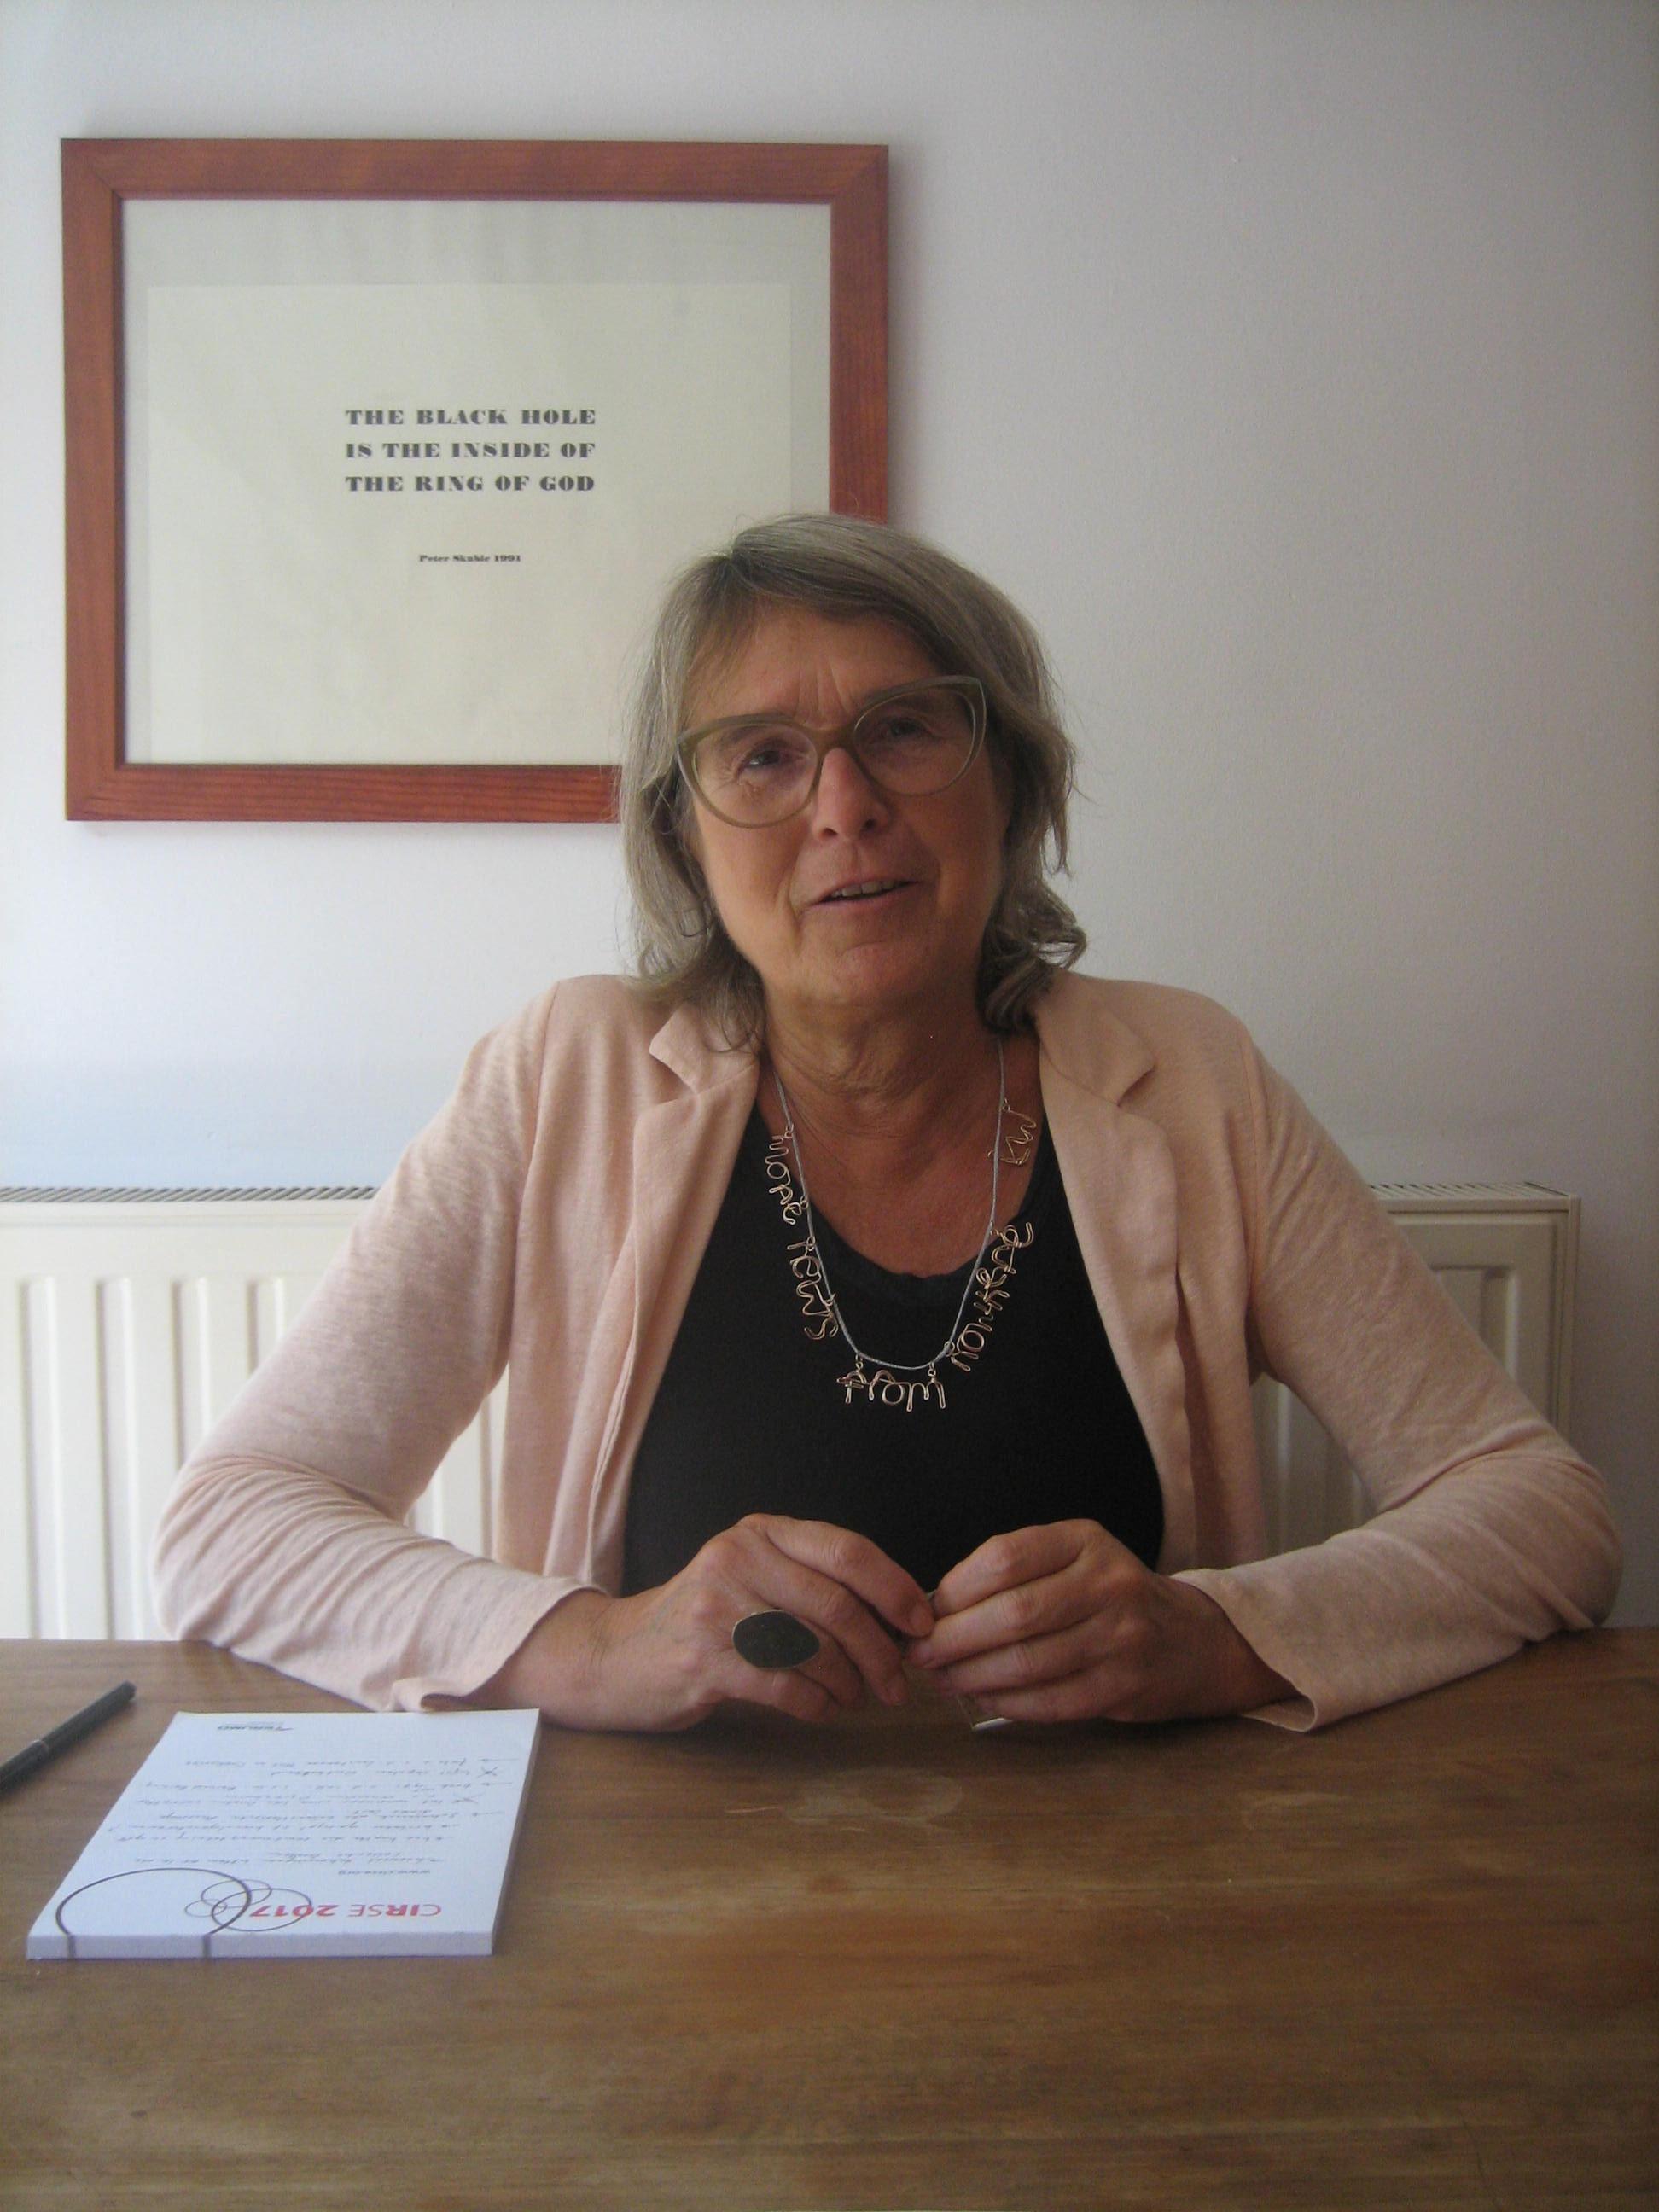 Liesbeth den Besten met halssieraad van Lisa Walker, portret, bril, ring